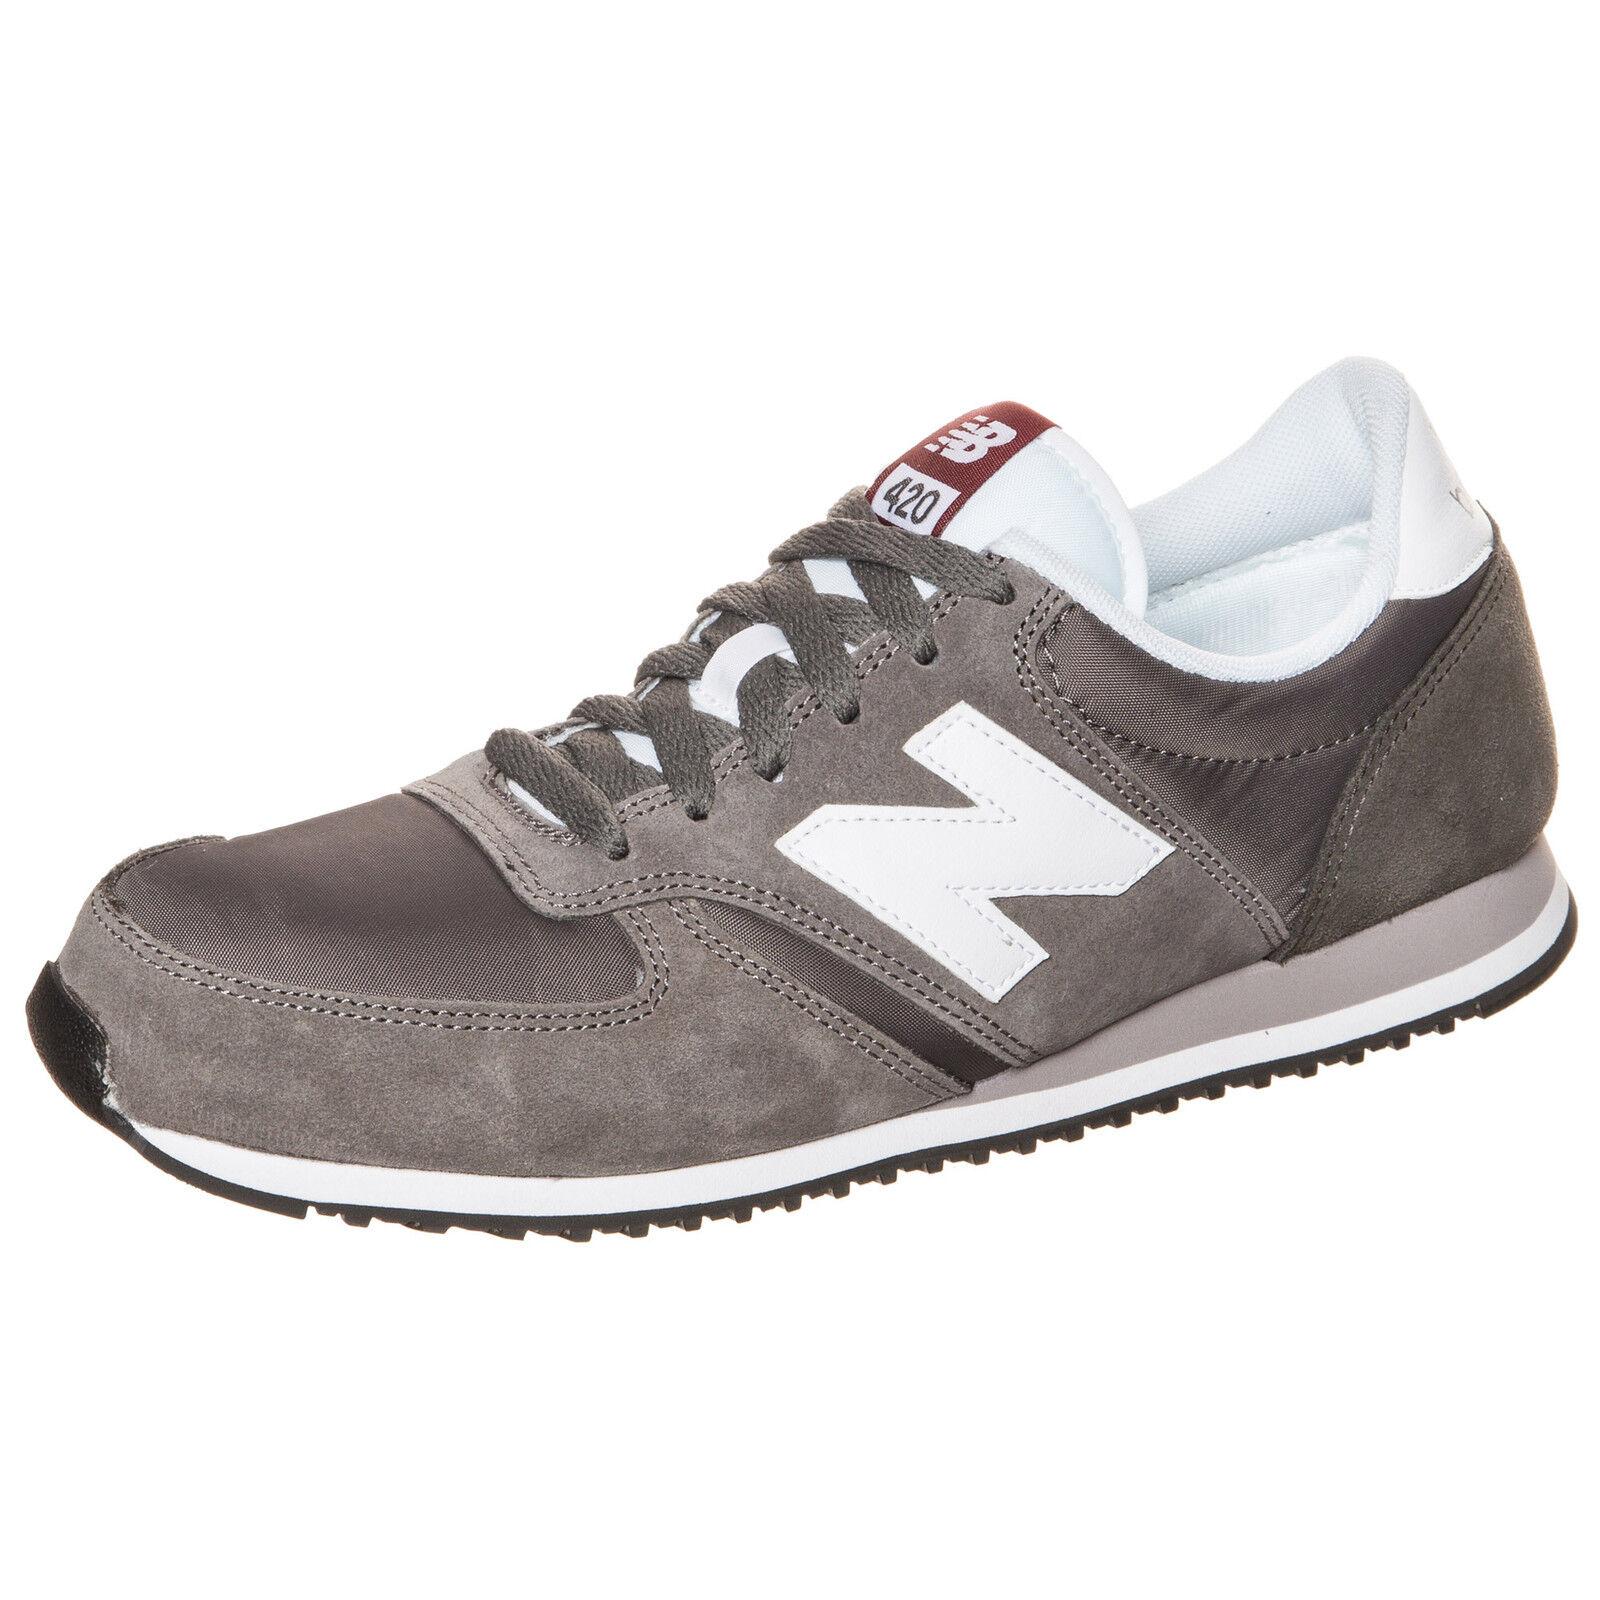 New Balance U420-CGW-D Sneaker Grau NEU Schuhe Turnschuhe